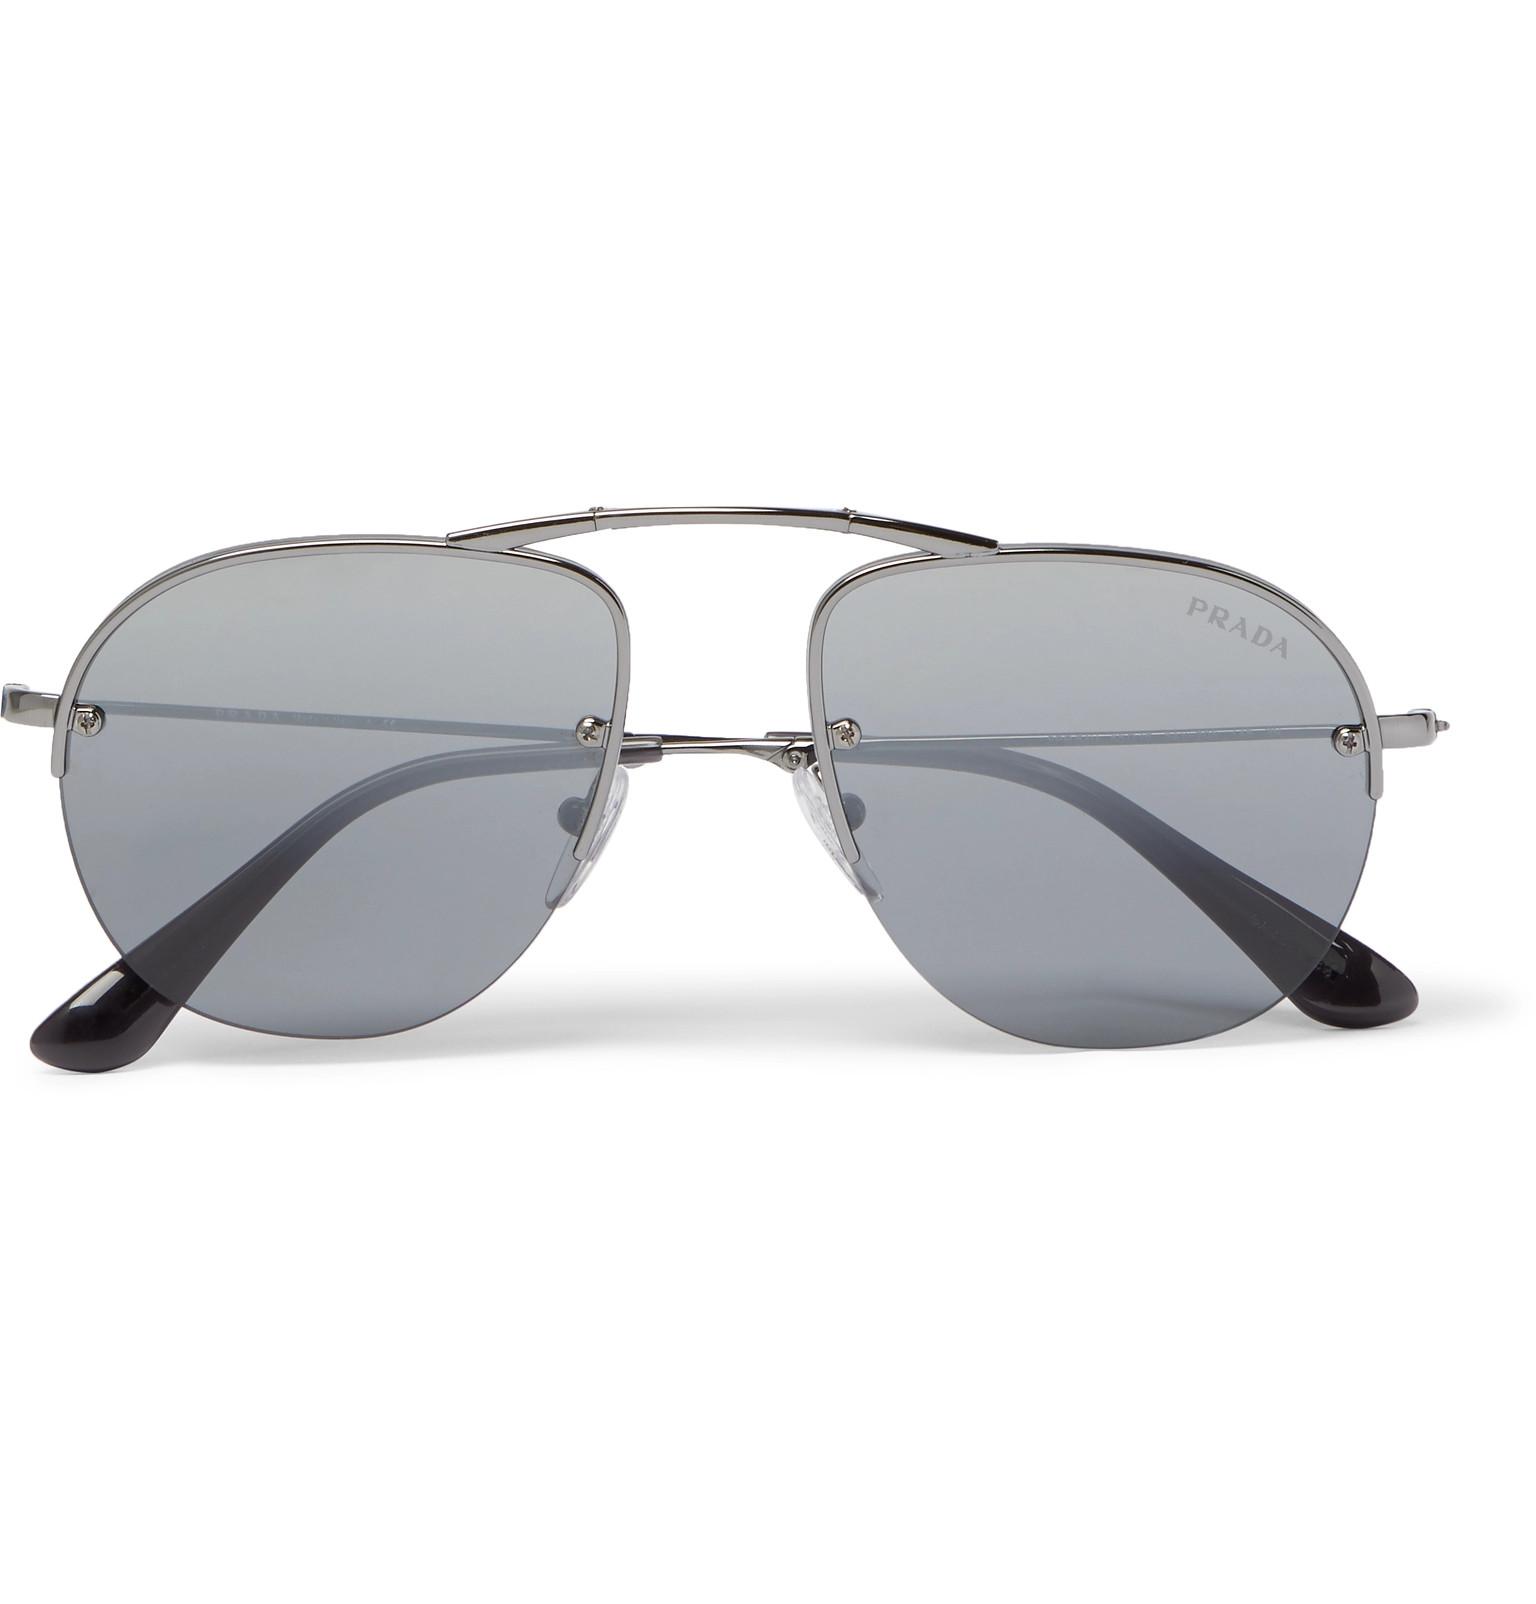 e444fb186b Prada - Aviator-Style Gunmetal-Tone Sunglasses